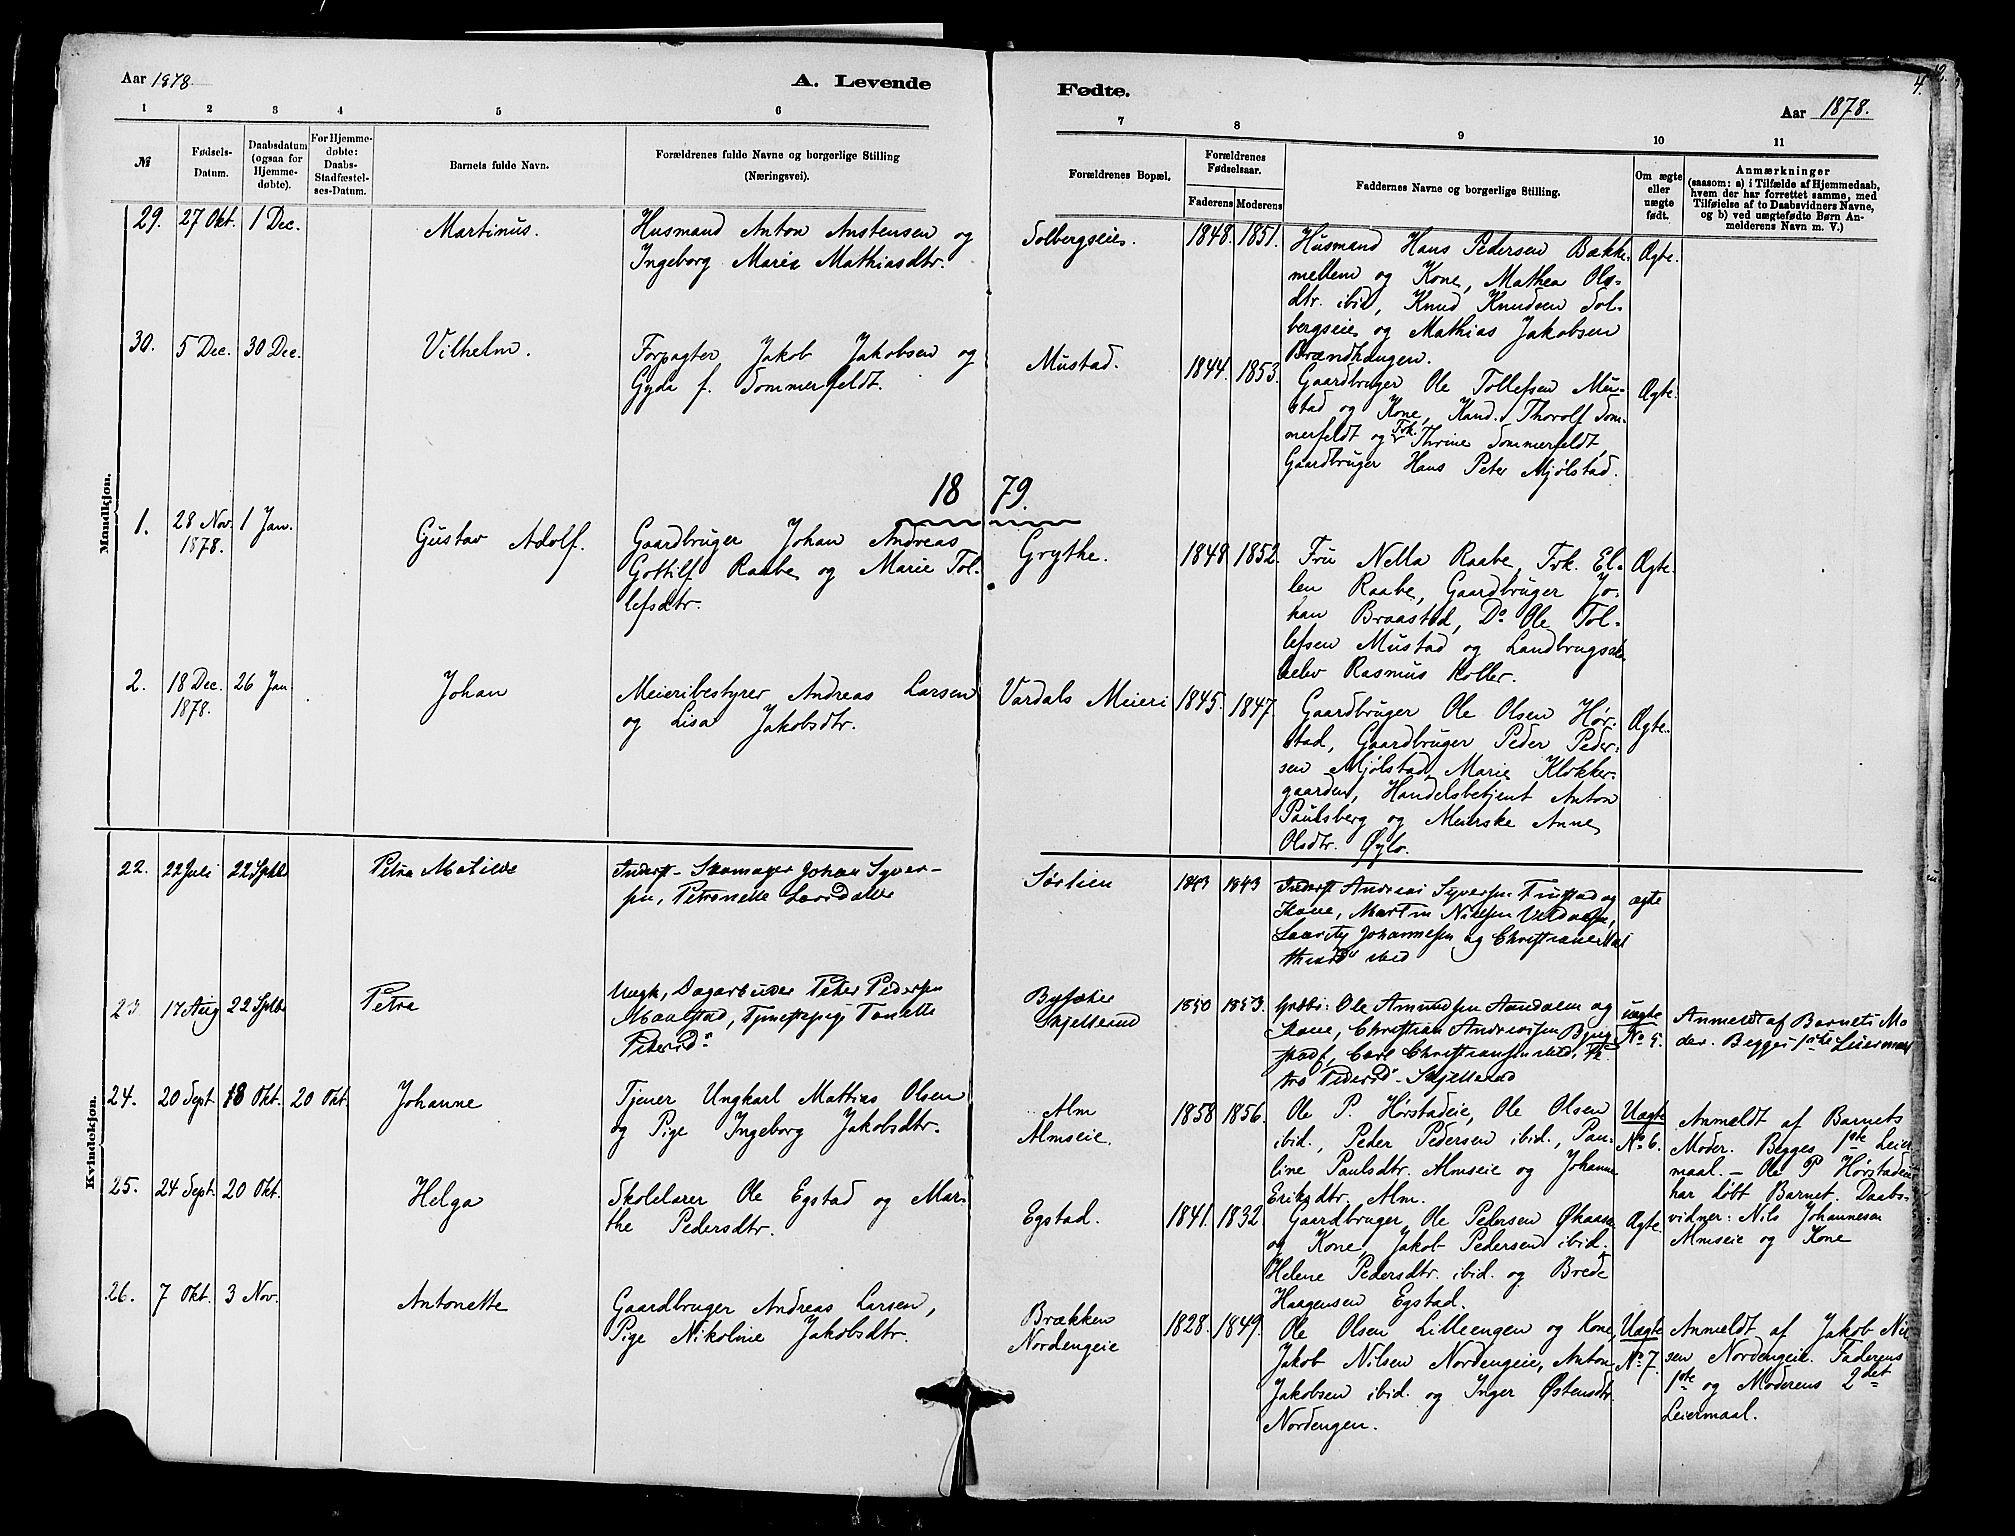 SAH, Vardal prestekontor, H/Ha/Haa/L0010: Ministerialbok nr. 10, 1878-1893, s. 4